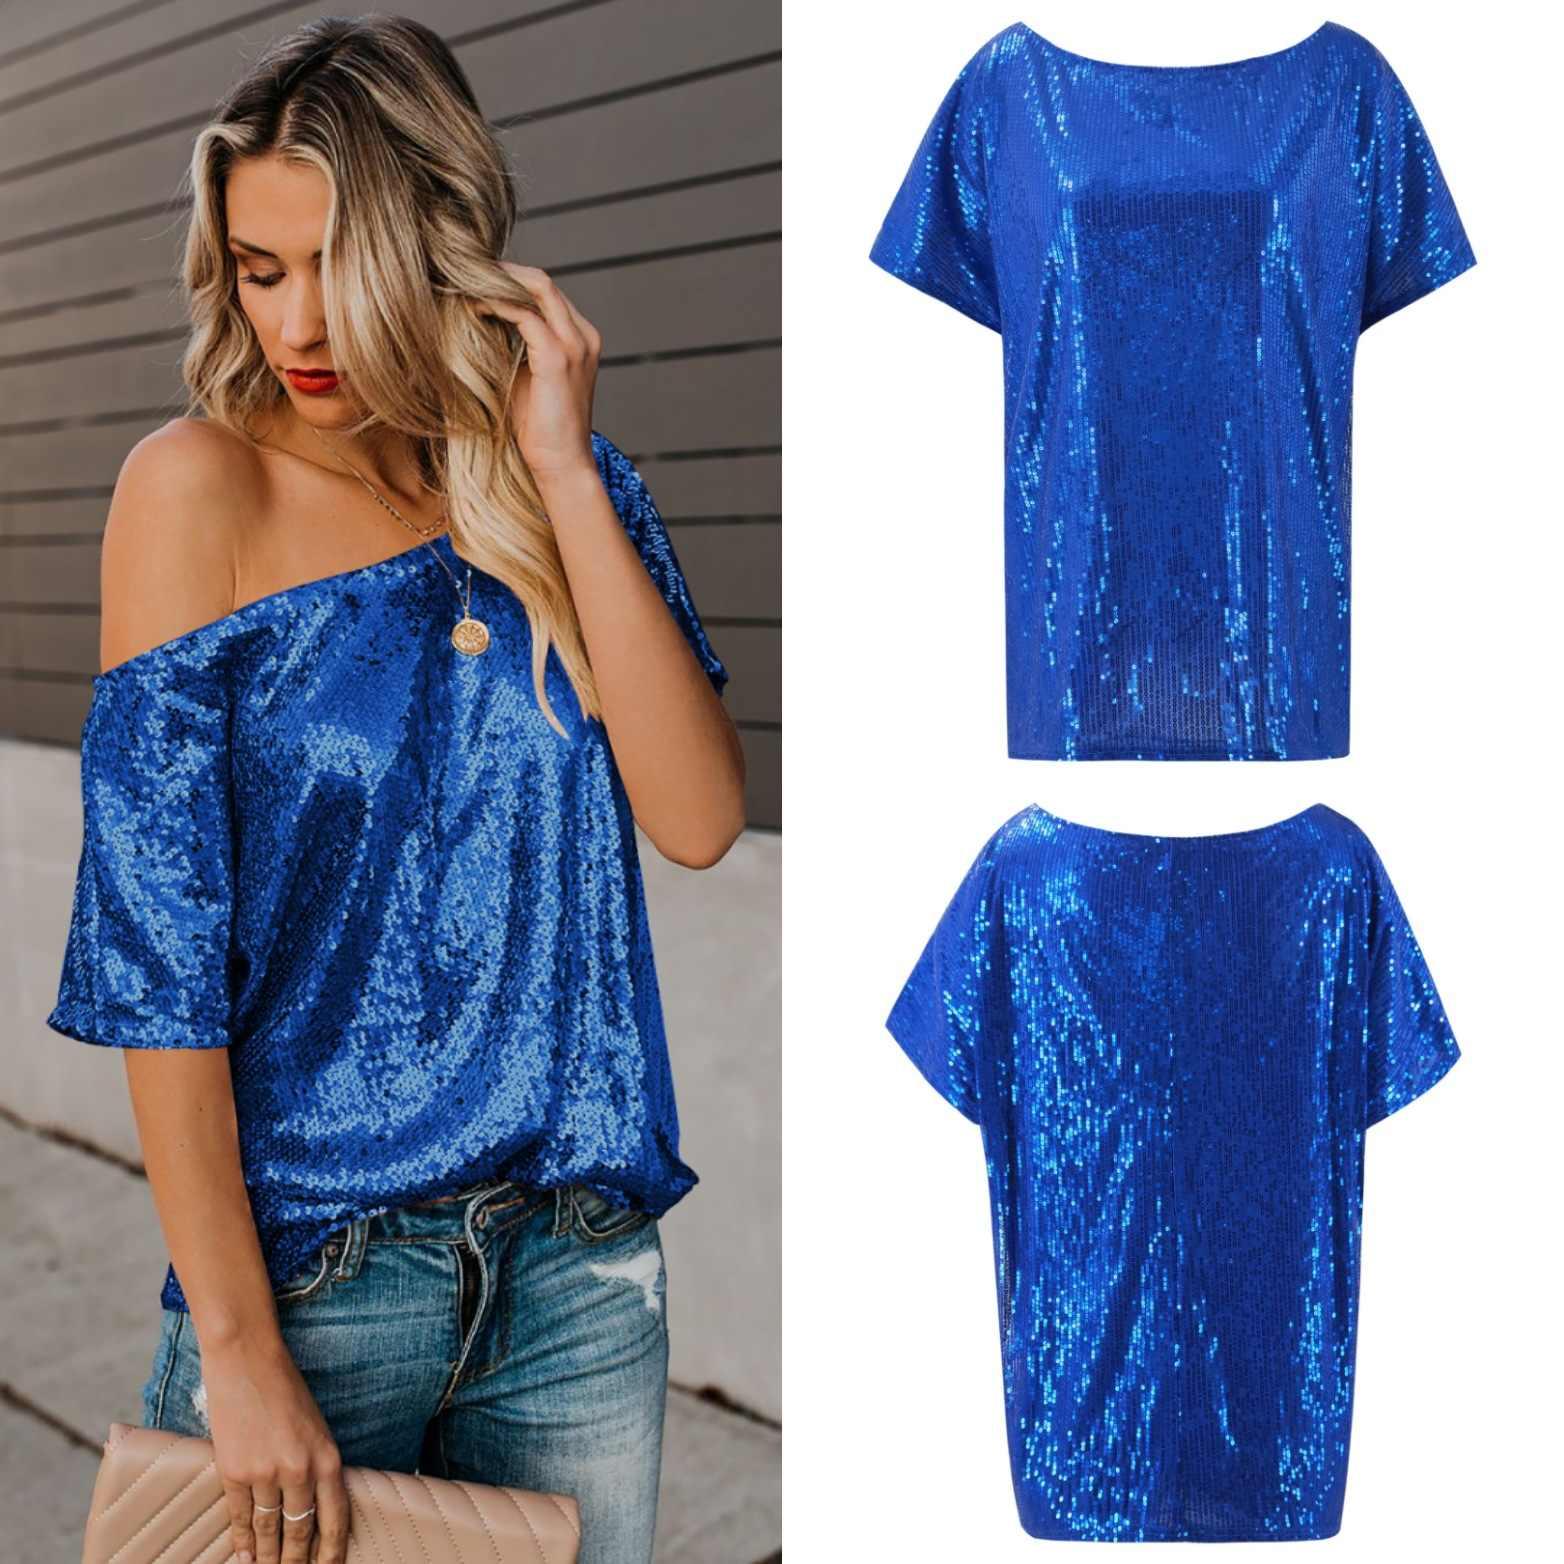 Sequin shirt silver sequin top Tee club Vrouwen Shirt Camiseta Mujer 2019 Verano Korte Mouwen blusas feminina Roze Zwart Goud blauw